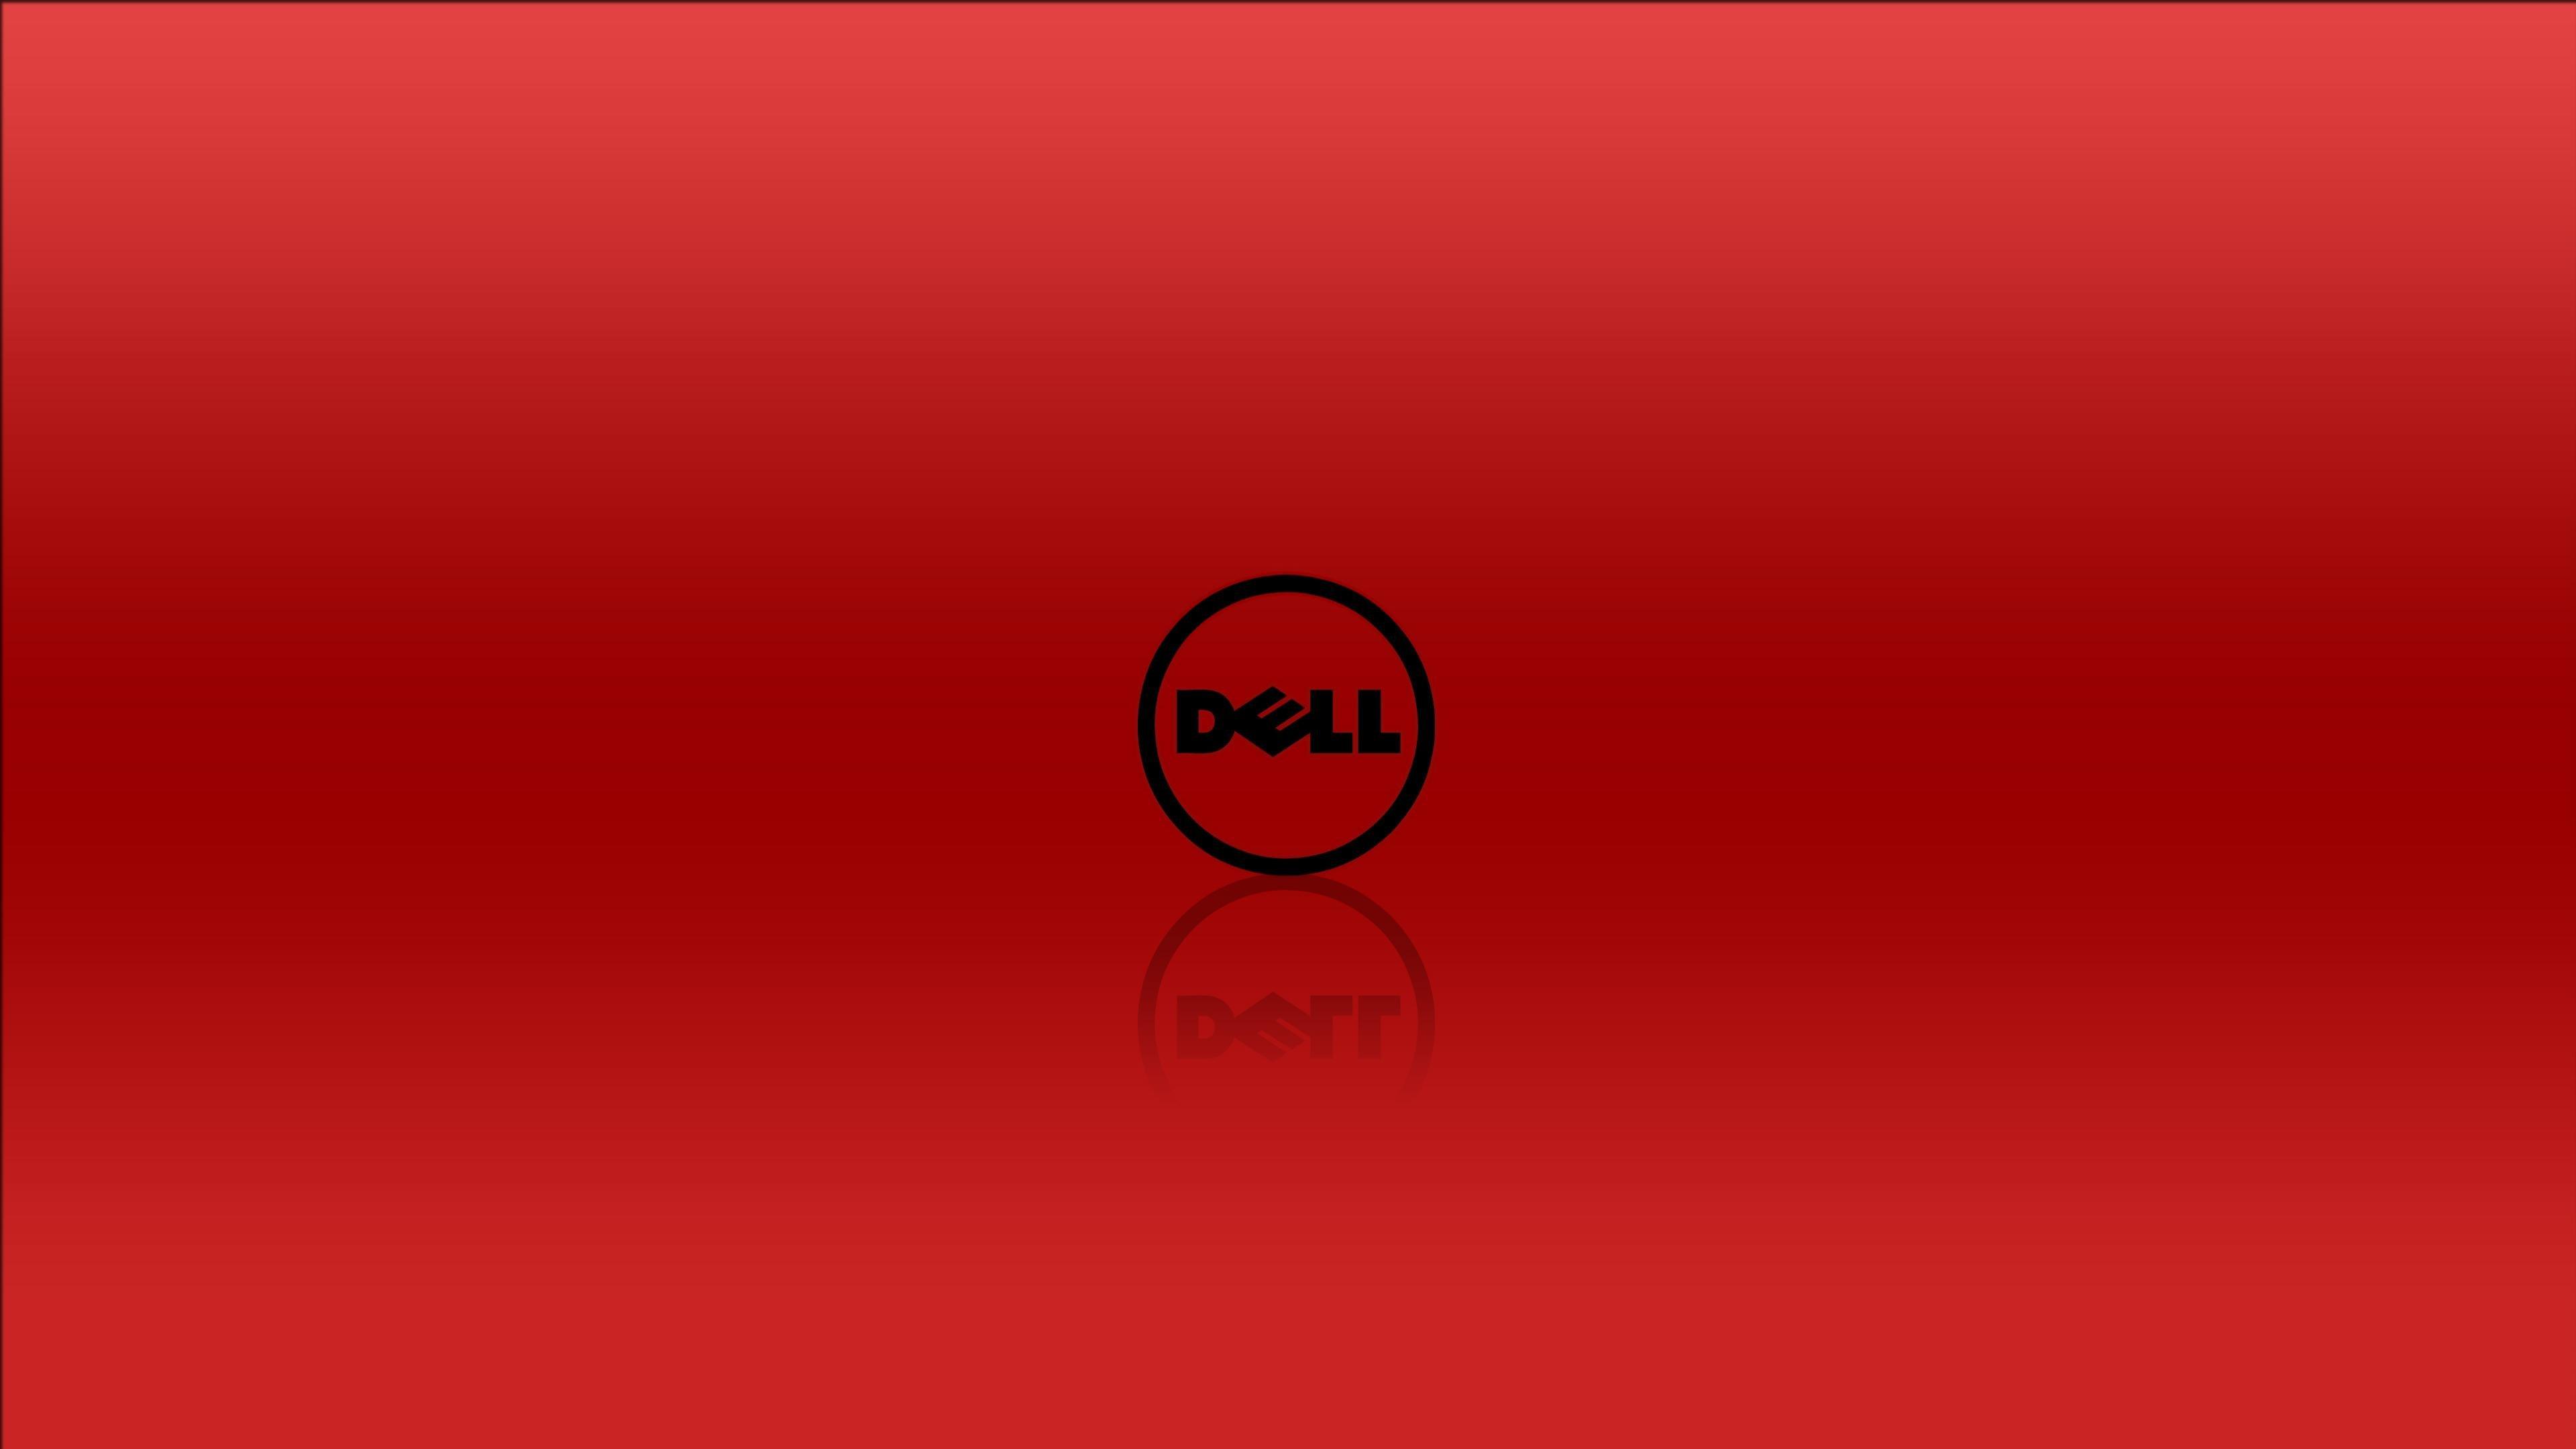 Dell wallpapers 3840x2160 Ultra HD 4k desktop backgrounds 3840x2160